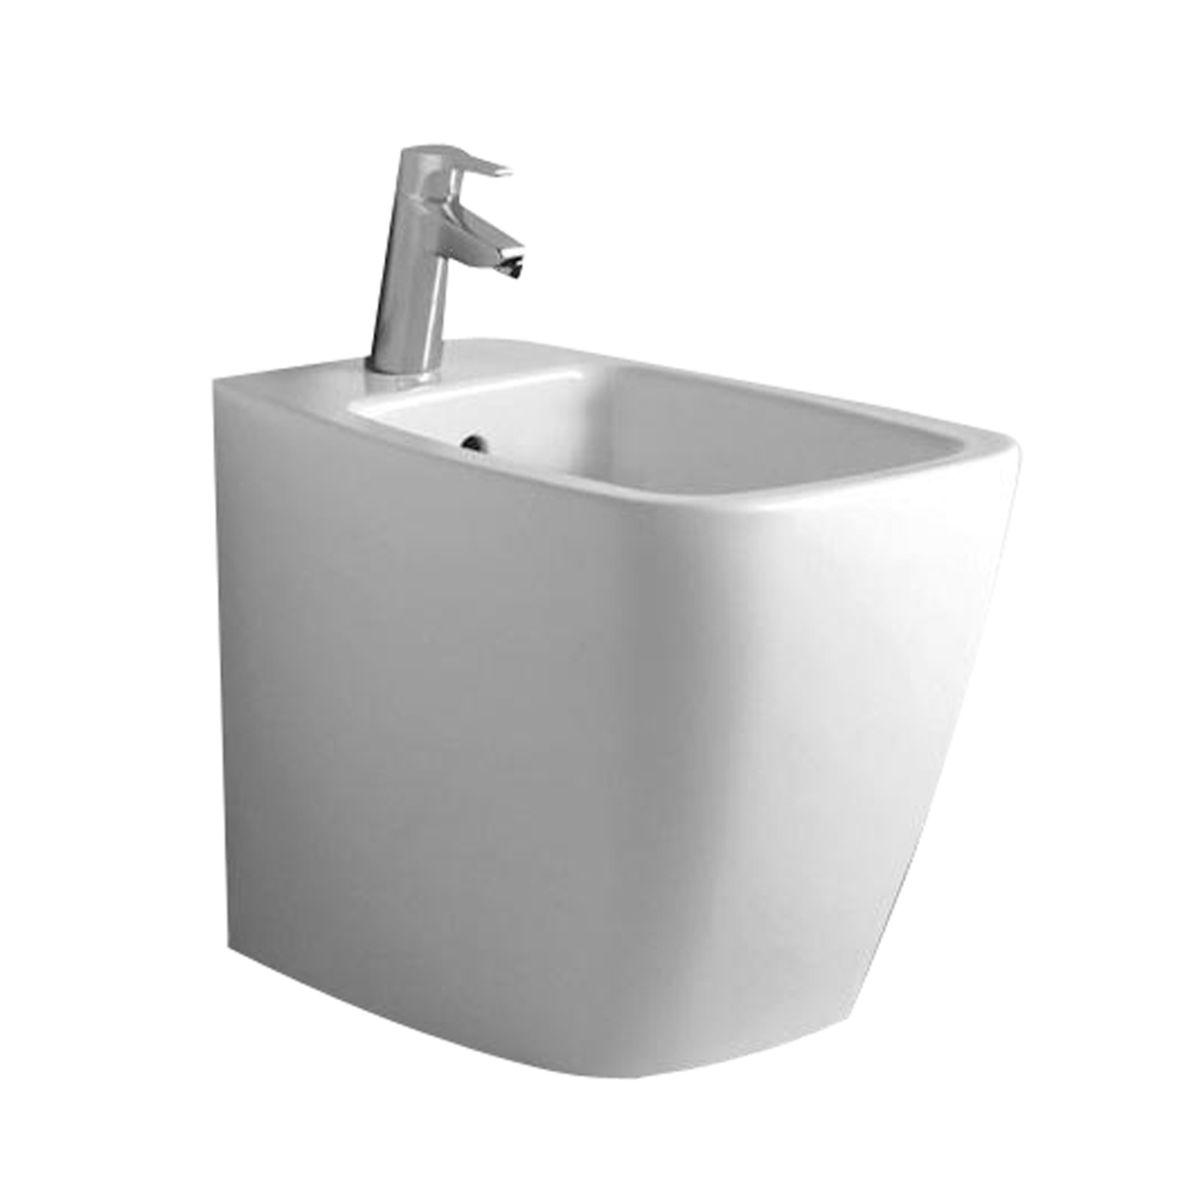 Bidet a pavimento filo muro 21 prezzi e offerte online - Prezzi sanitari bagno leroy merlin ...